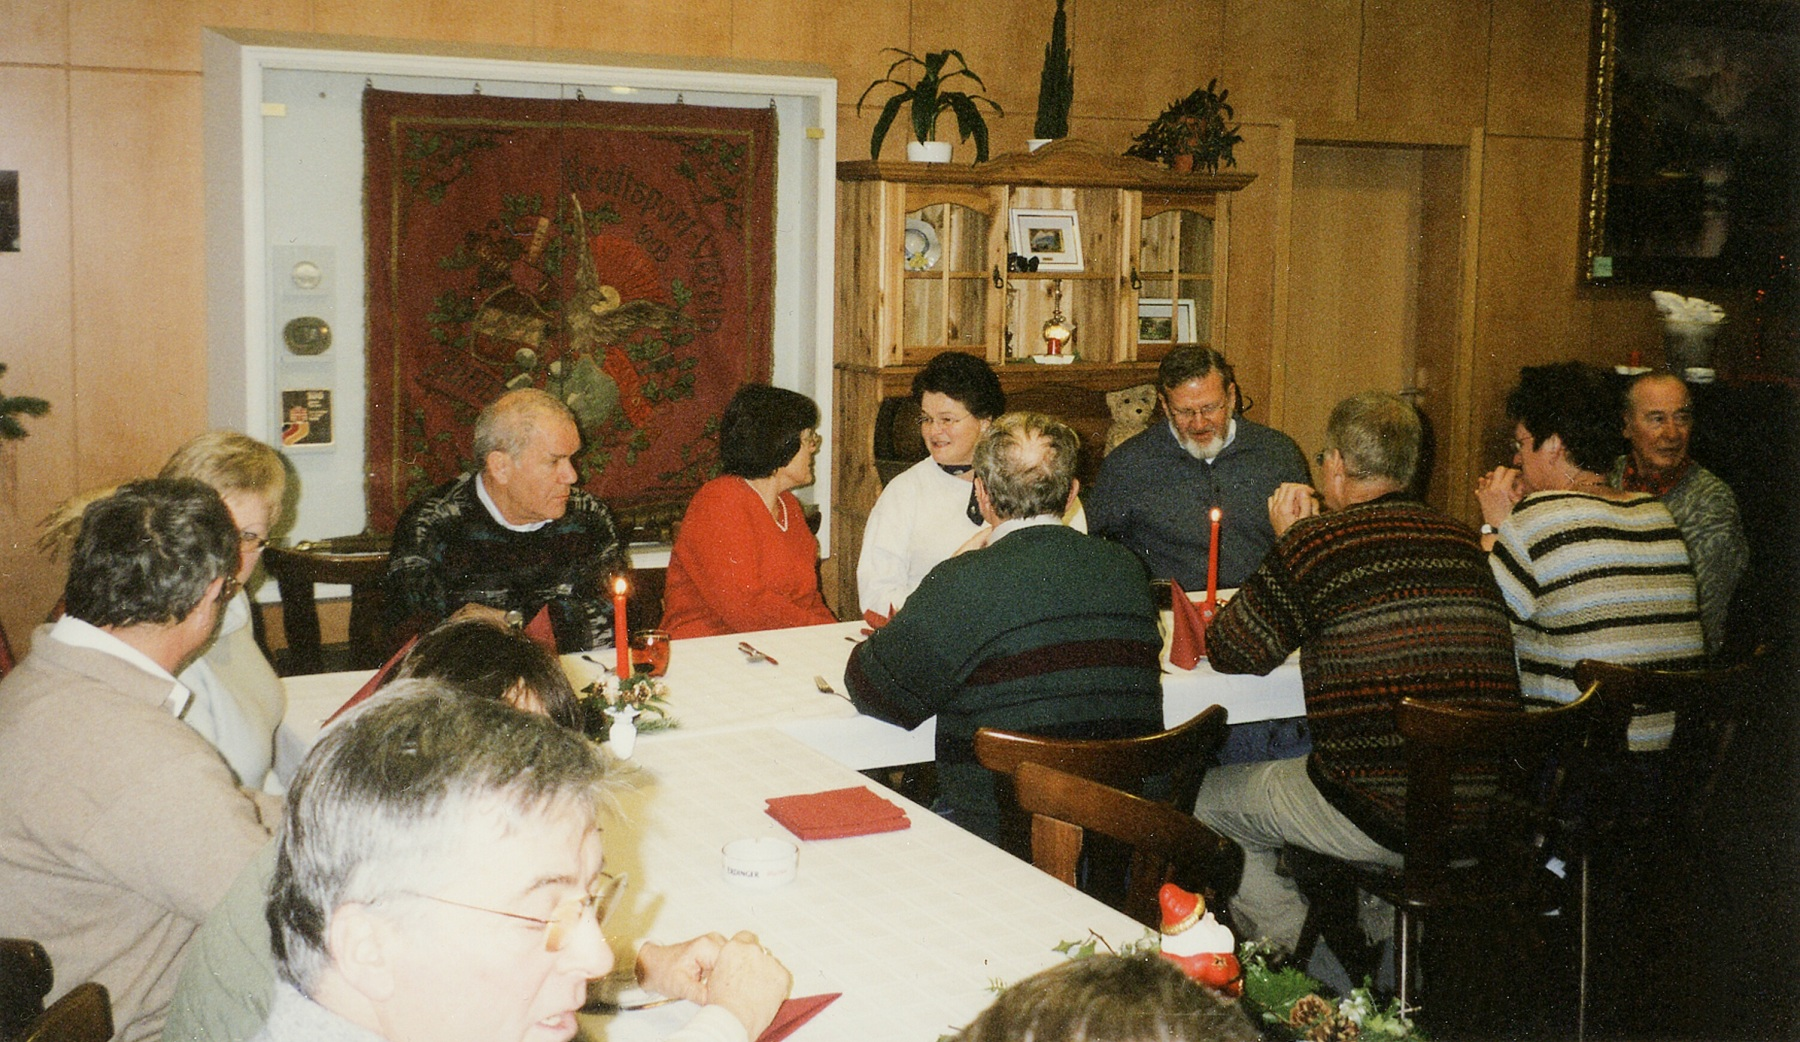 2002_12_11 Ulm, Abschluss in Zuffenhausen